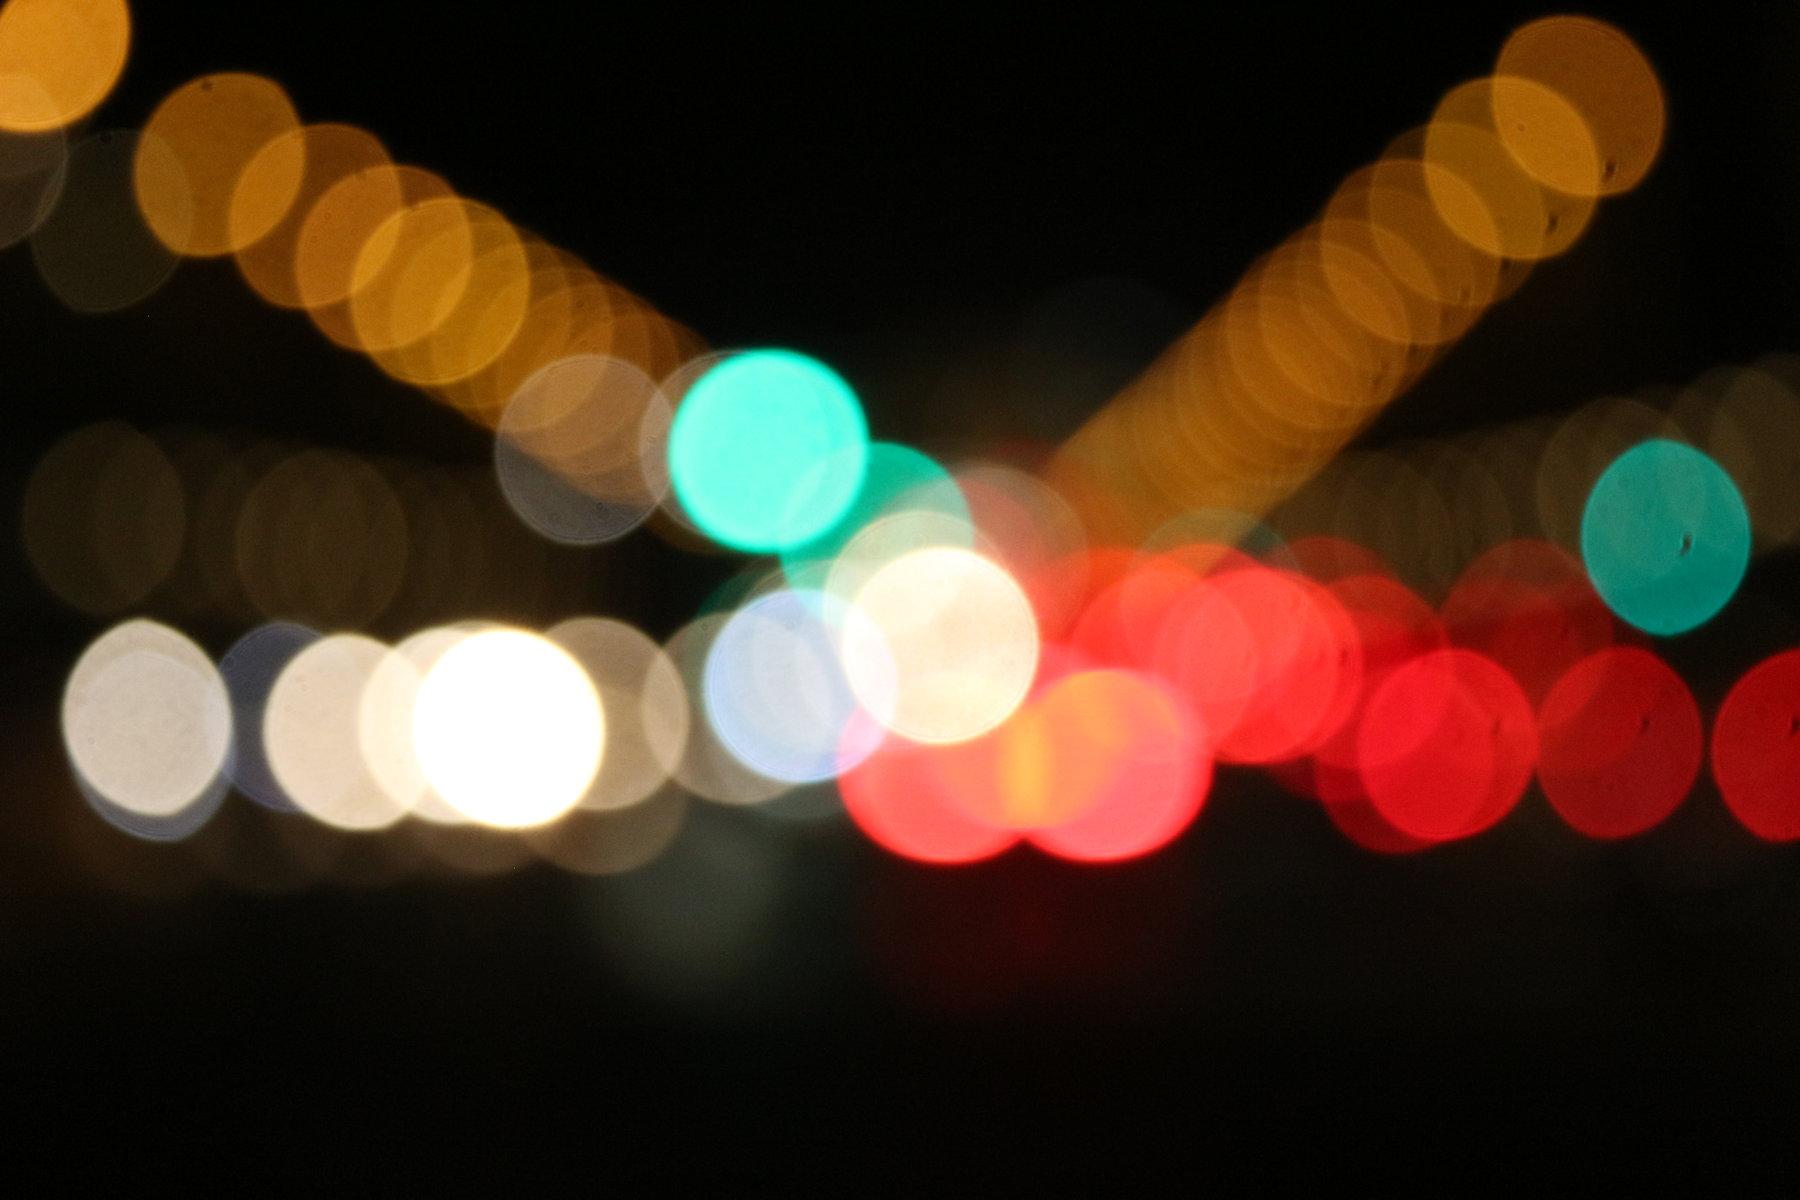 nacht_lichter_unscharf